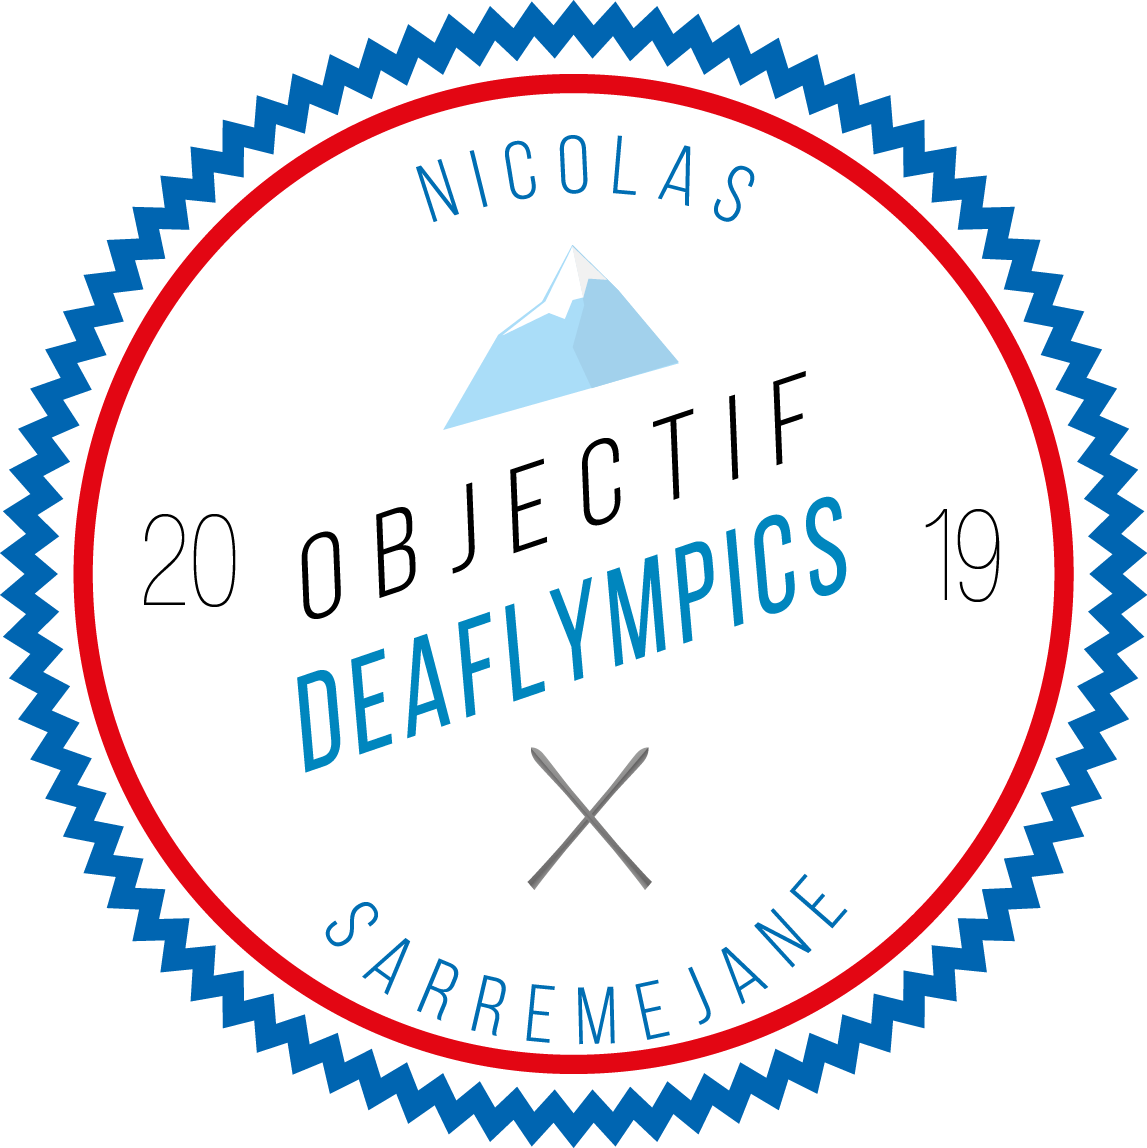 Logo Nicolas Sarremejane